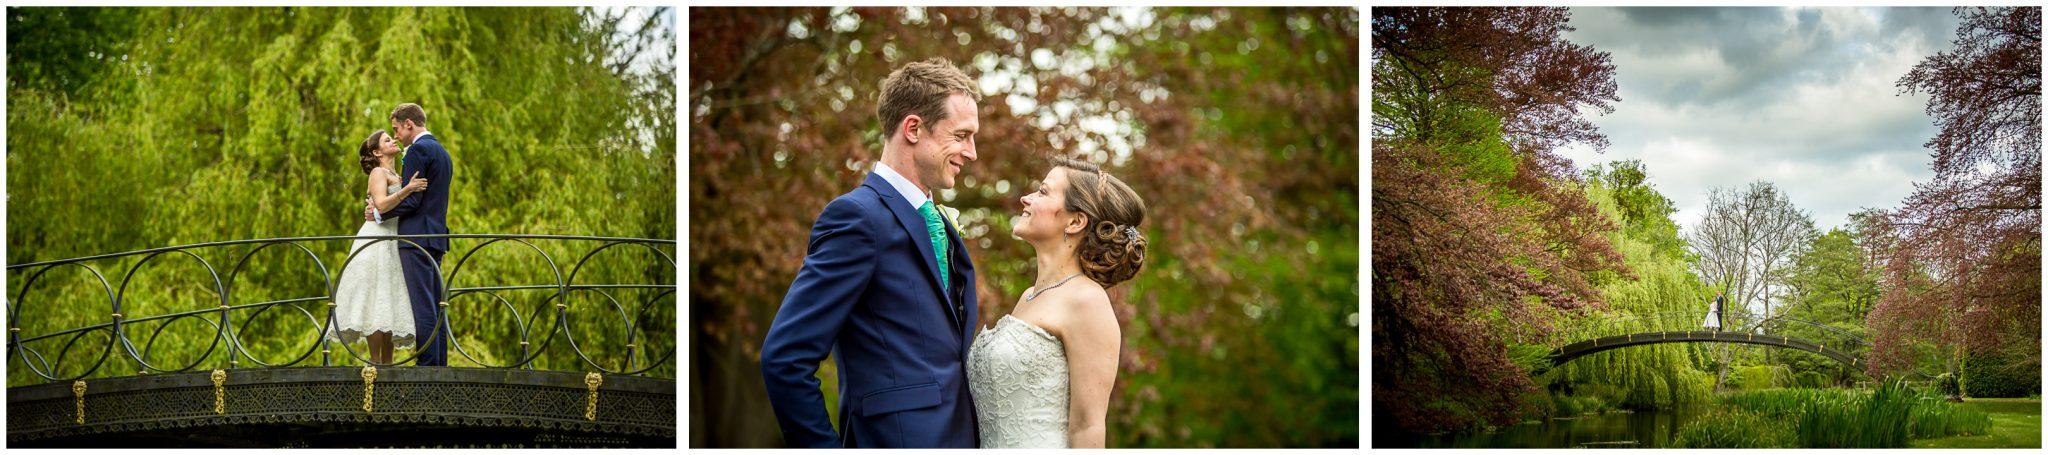 Avington Park wedding photography couple portraits